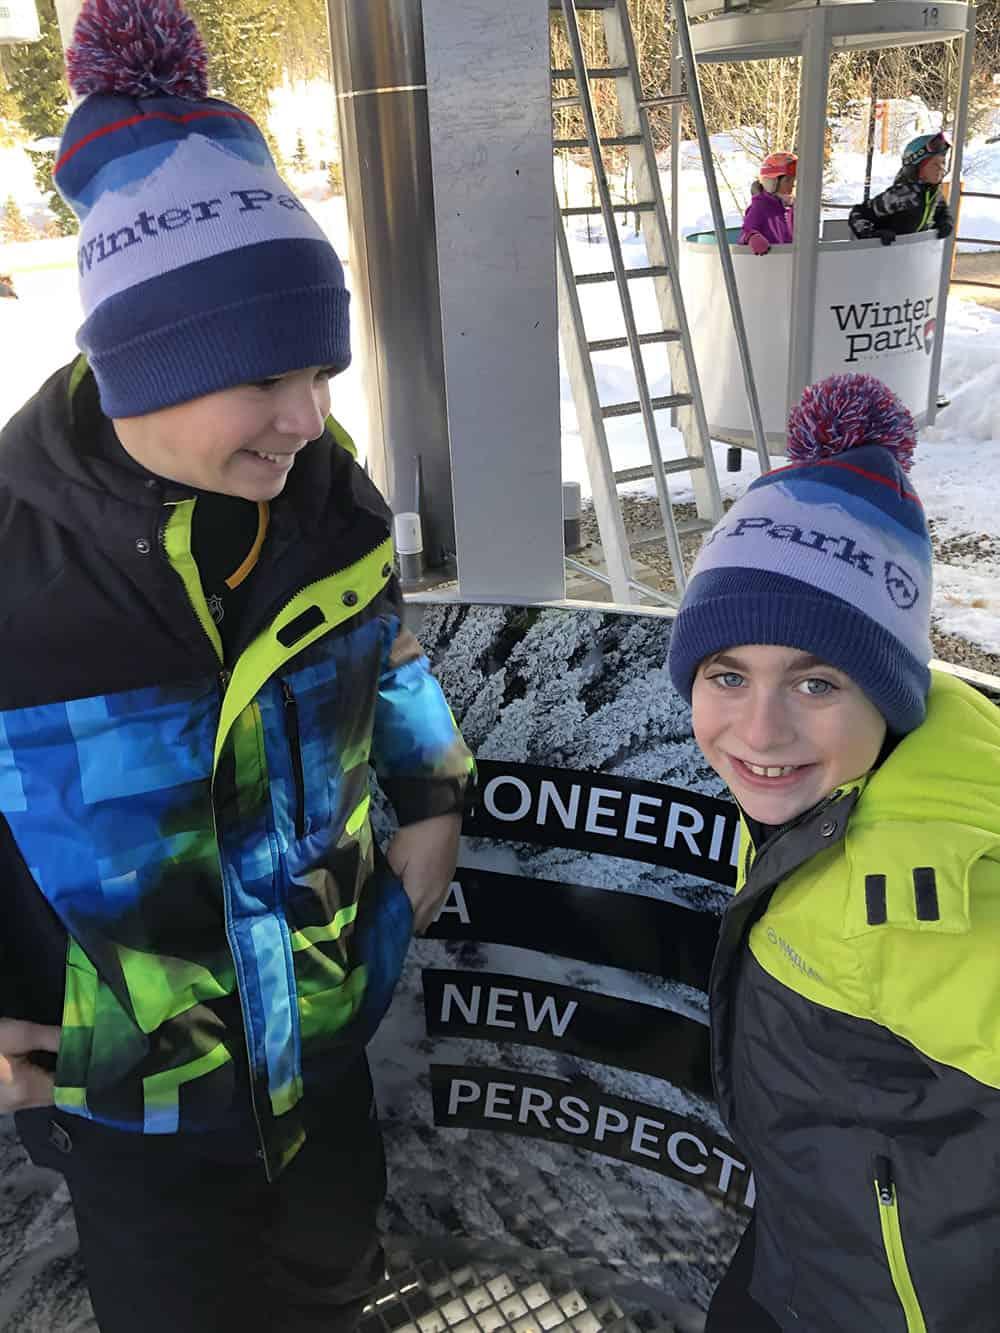 happy kids ski vacation winter park